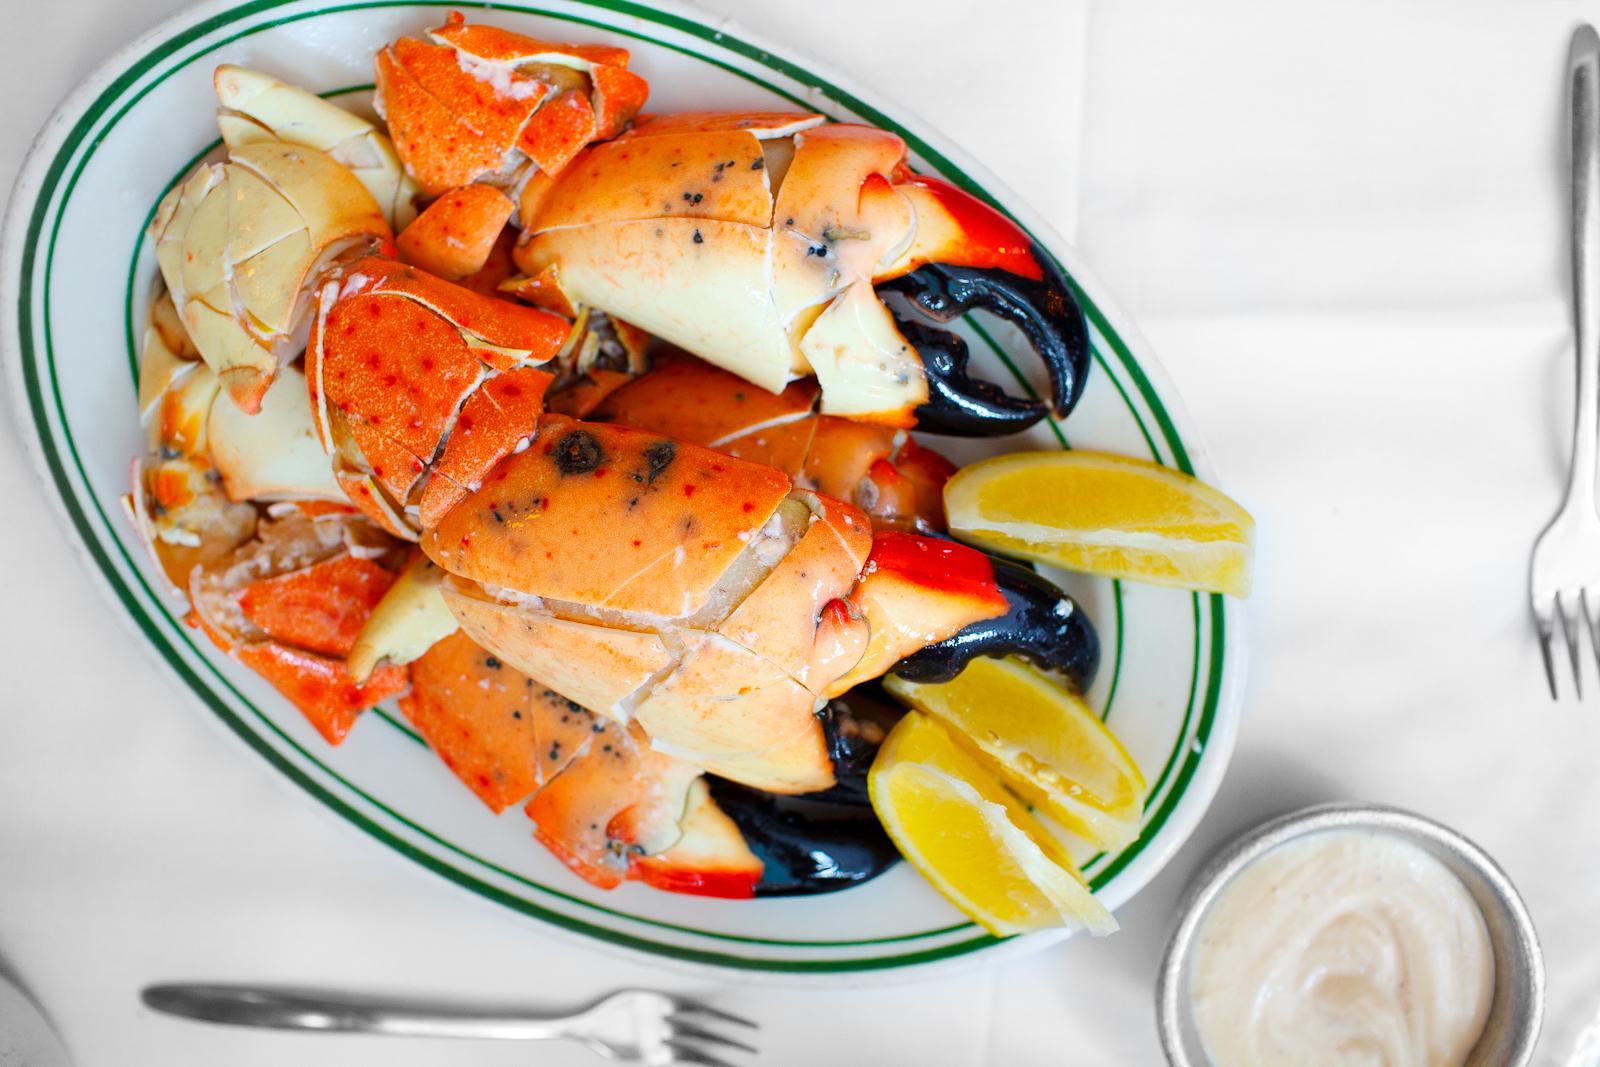 Jumbo stone crabs ($71.95)